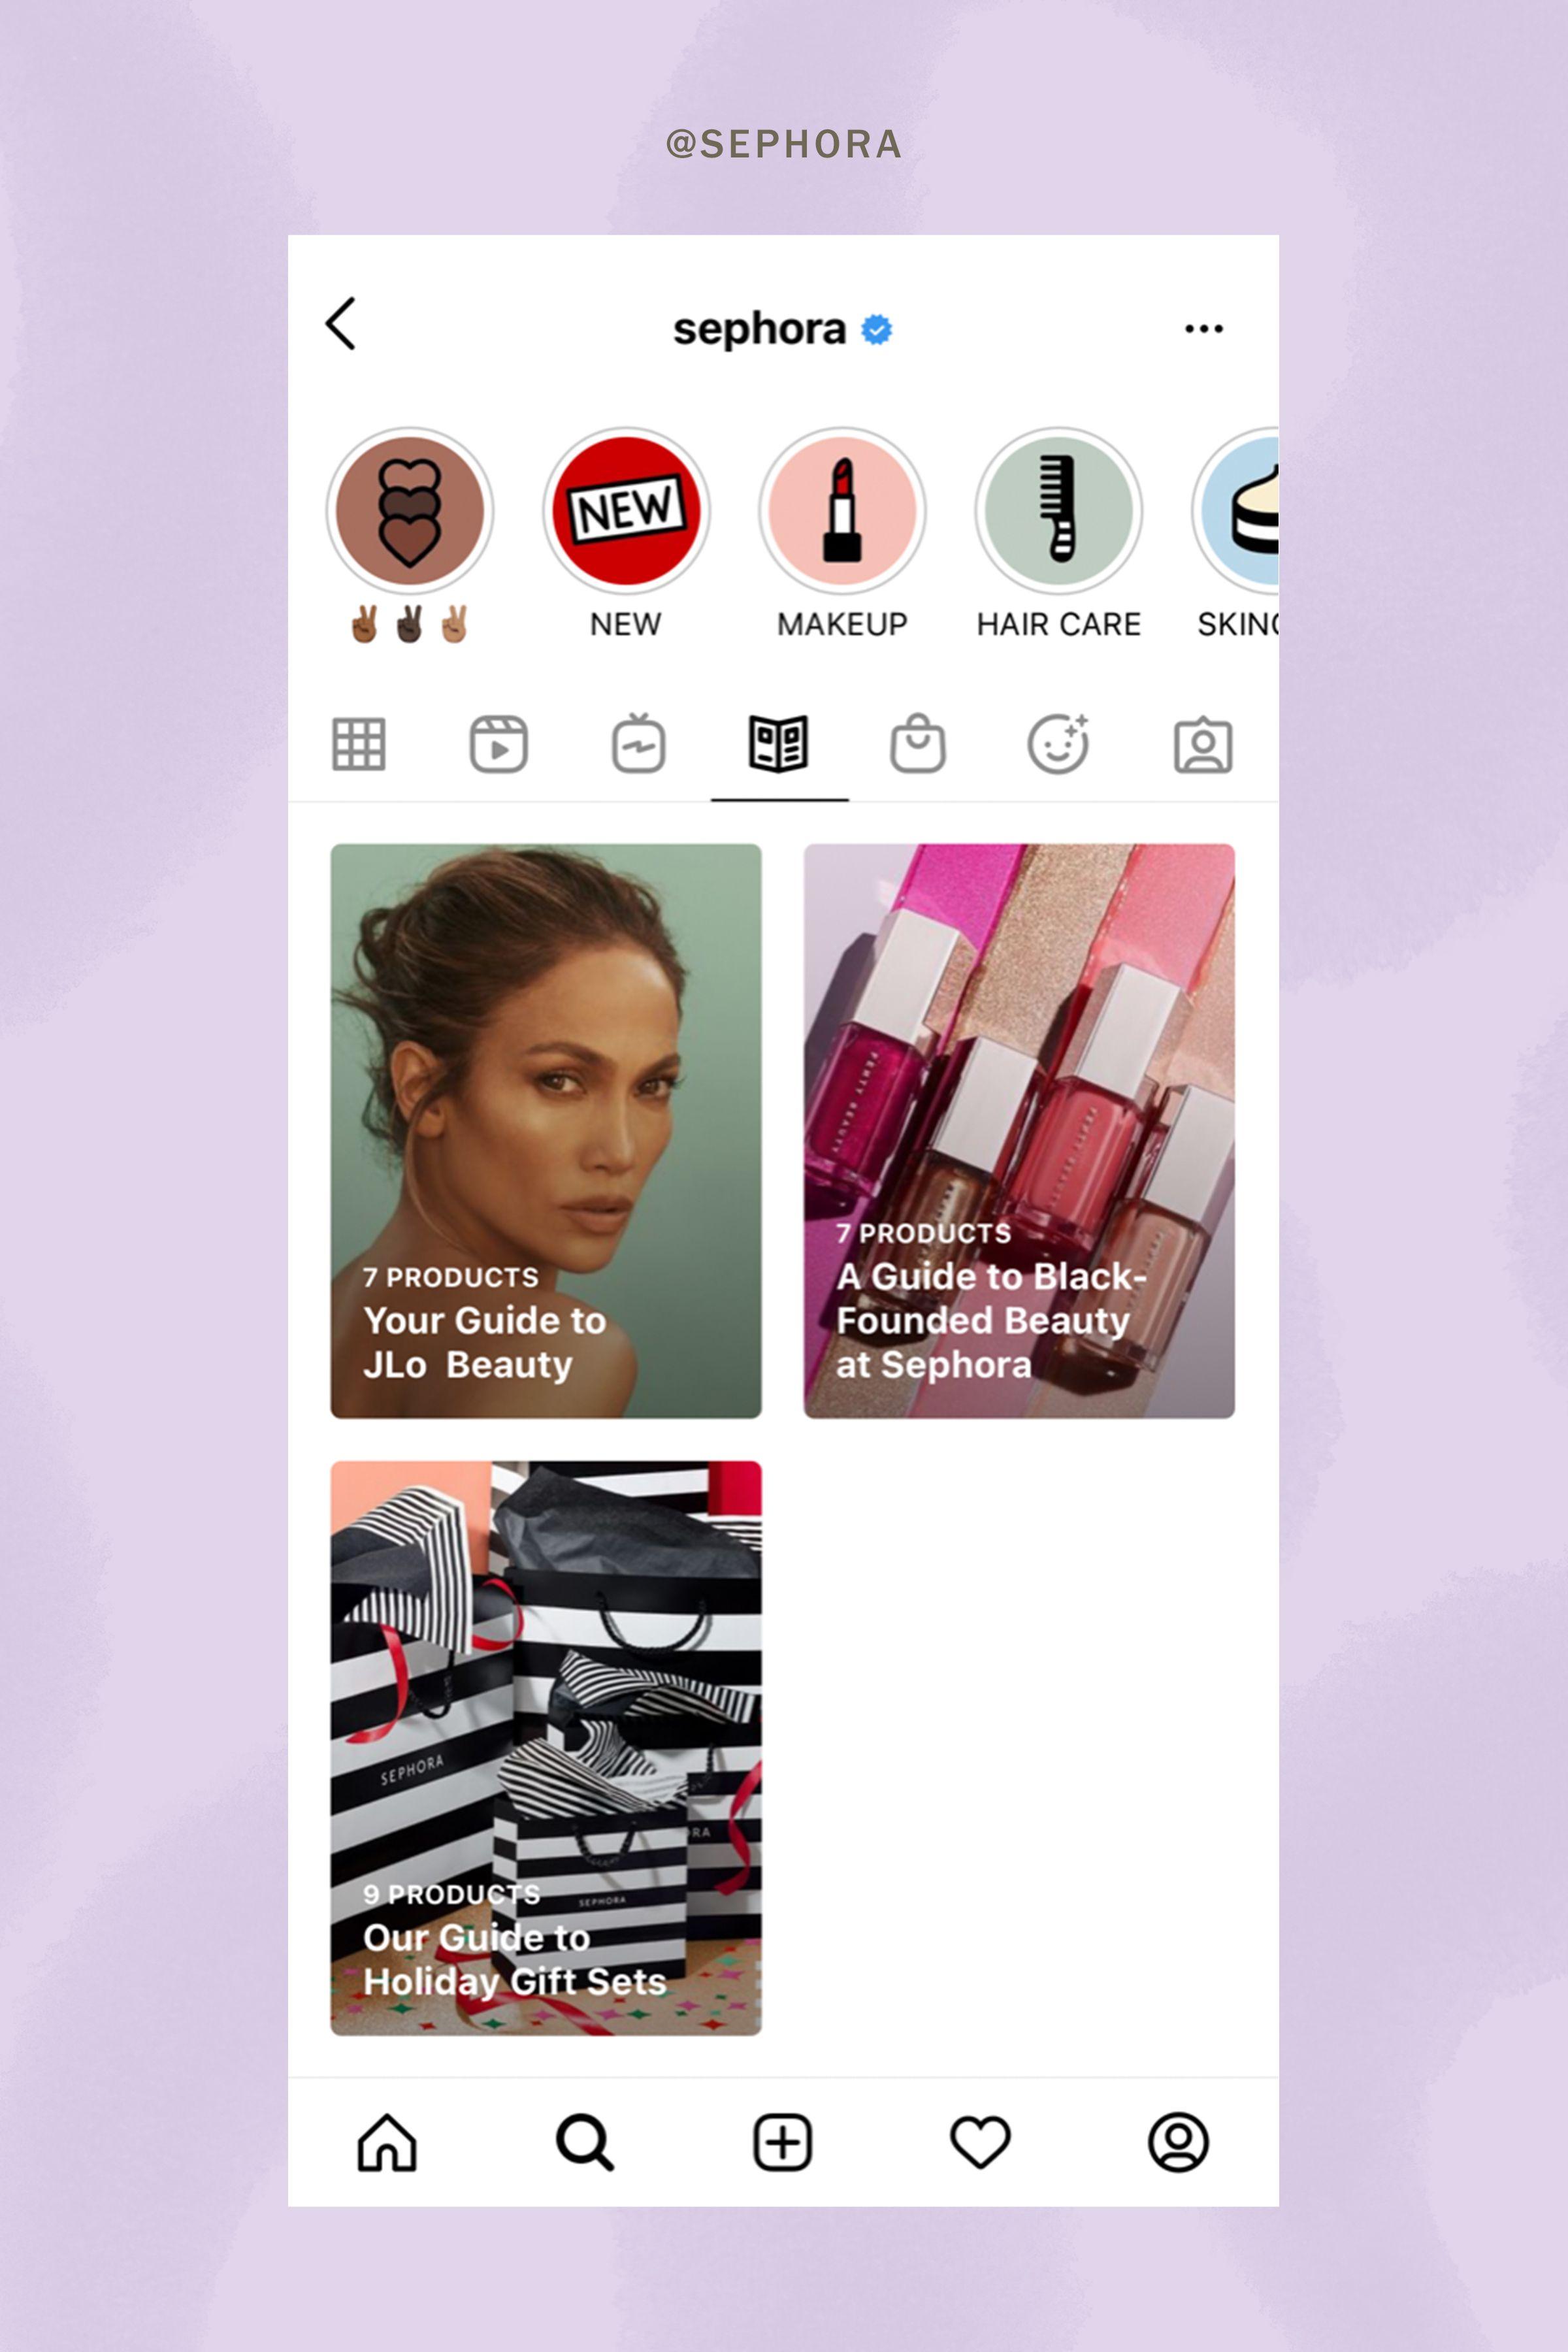 PLANOLY - Blog Post - Instagram Marketing Tips 2021 - Image 3